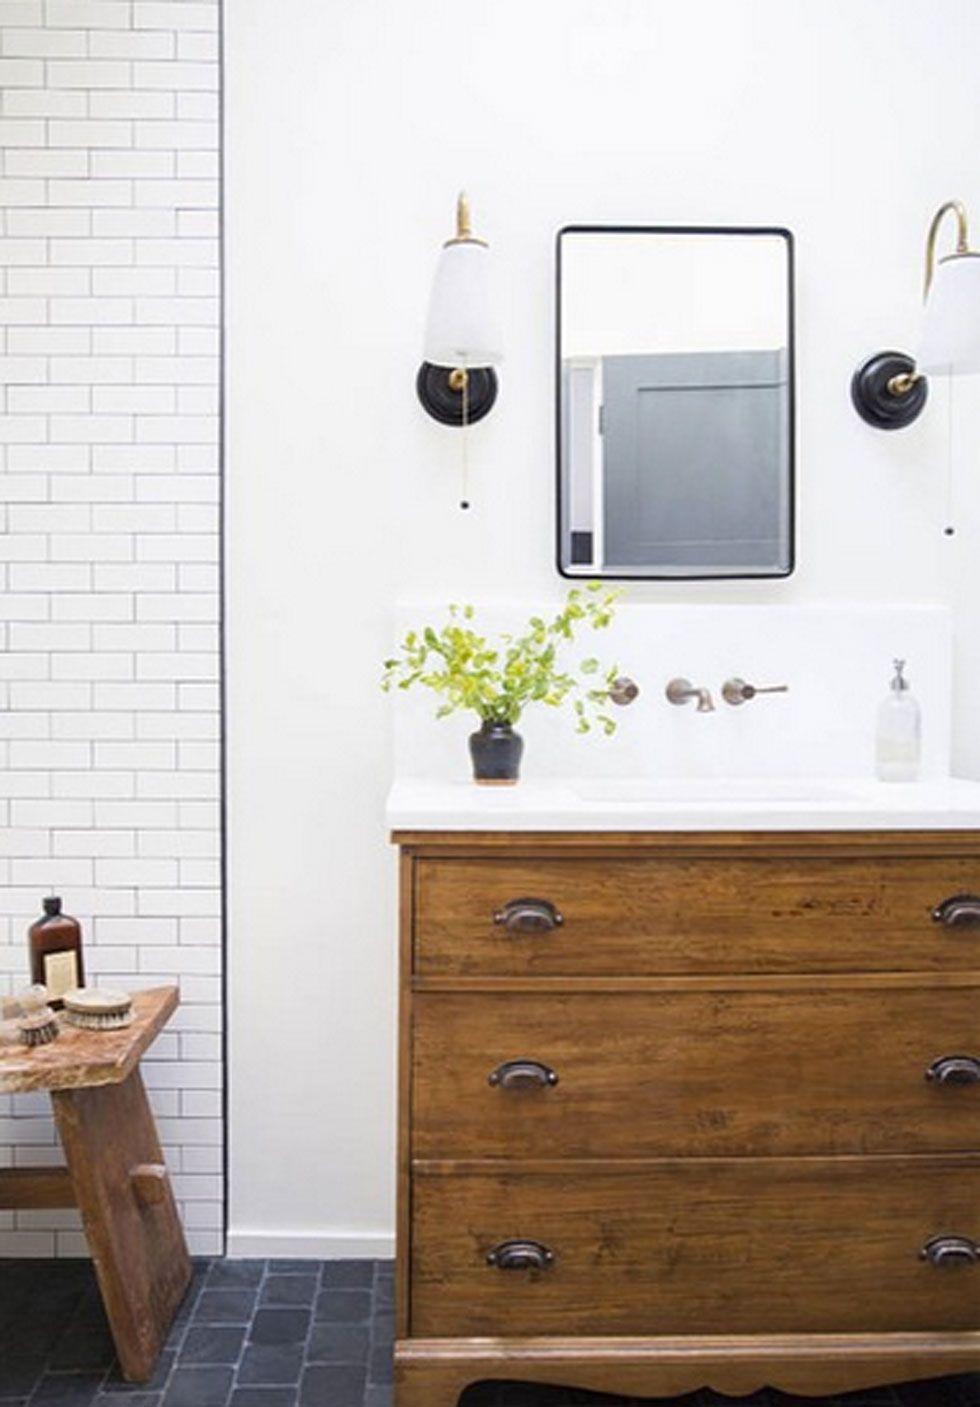 Dresser Into A Bathroom Vanity, Dresser Made Into Bathroom Vanity